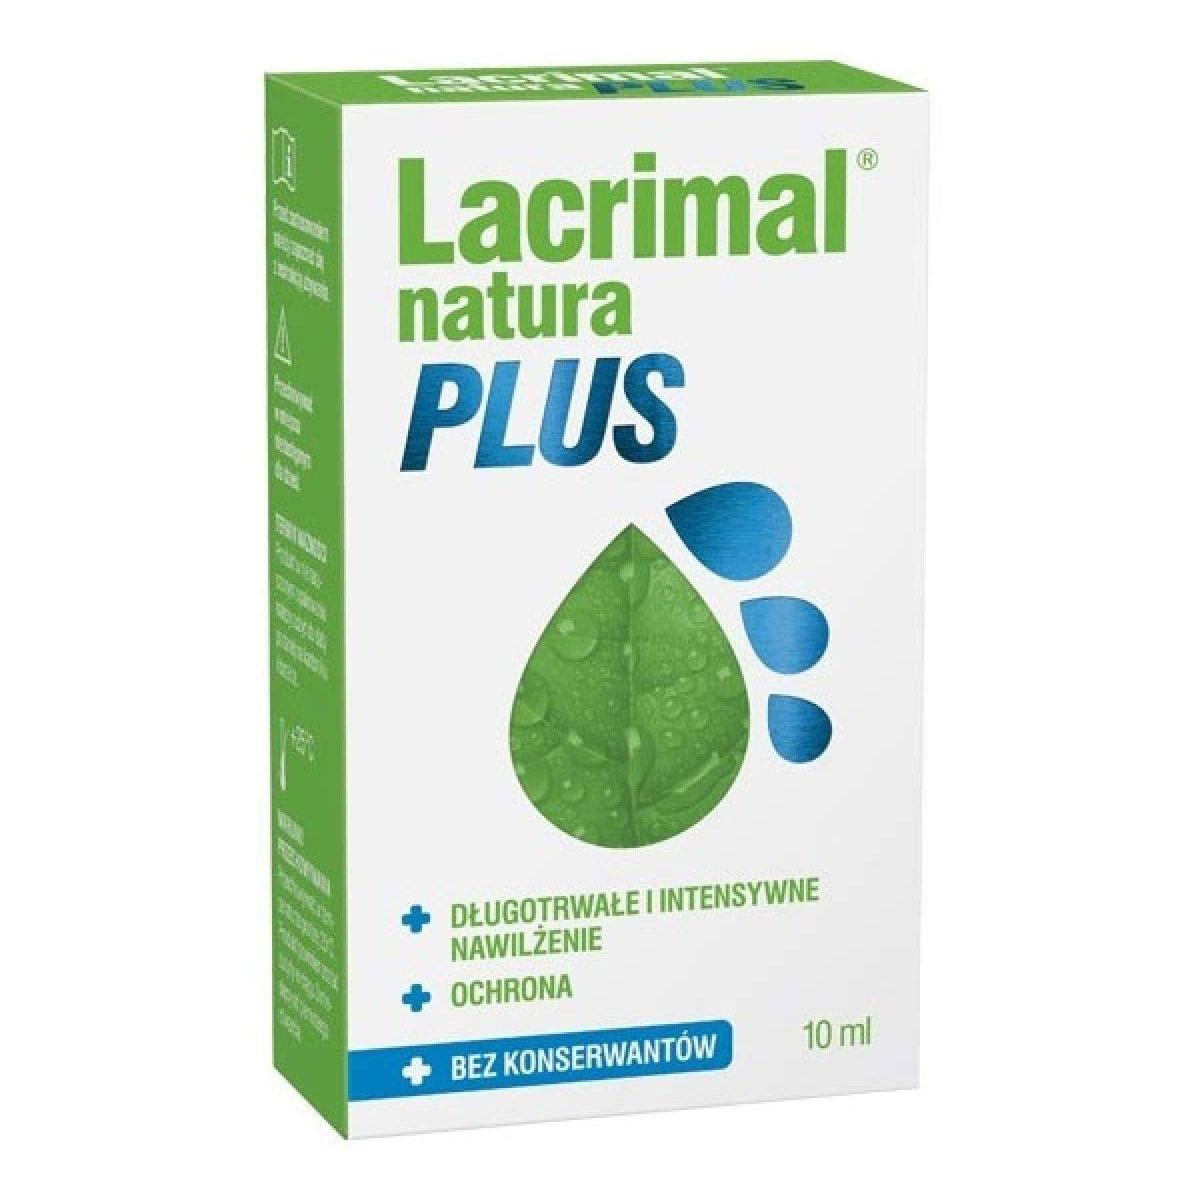 Lacrimal Natura Plus krople do oczu 10 ml